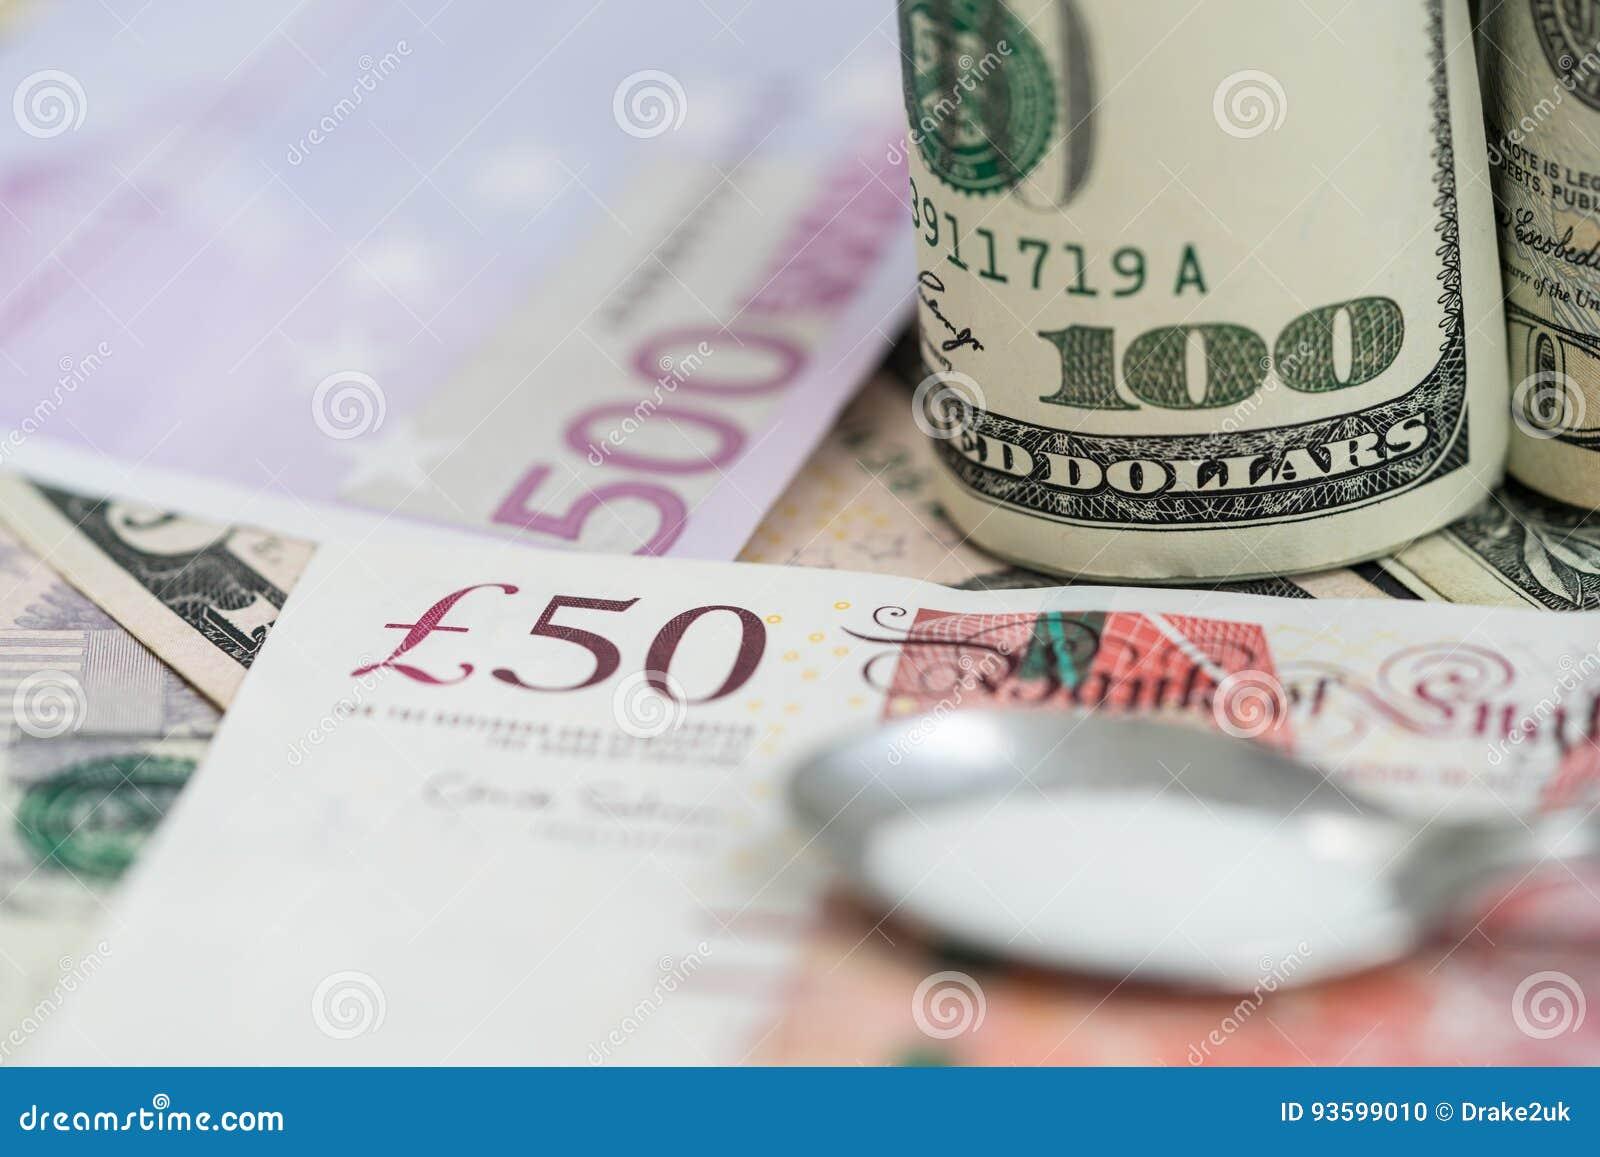 50 pounds in euros